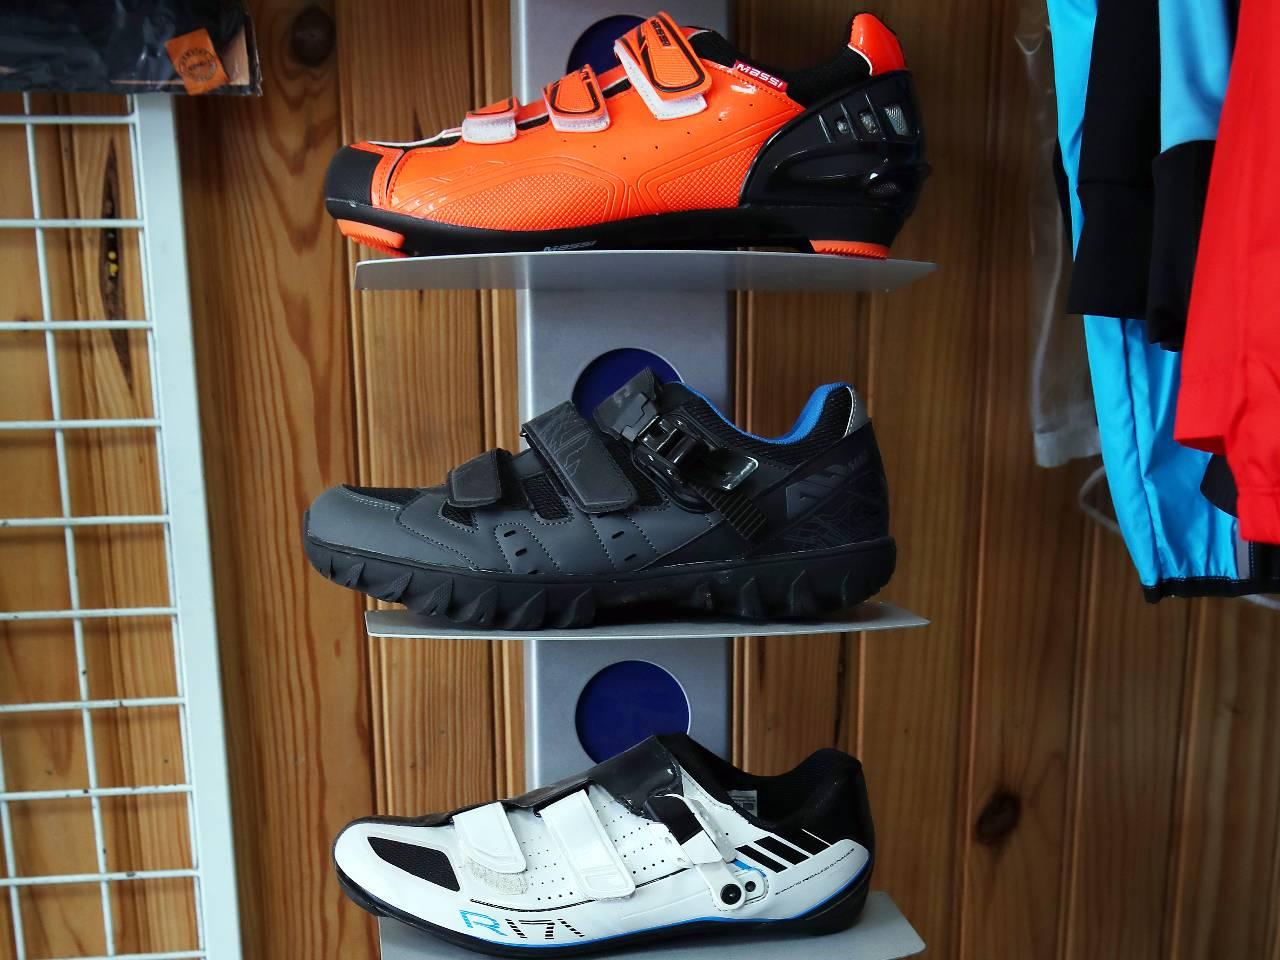 Chaussures vélo route ou VTT